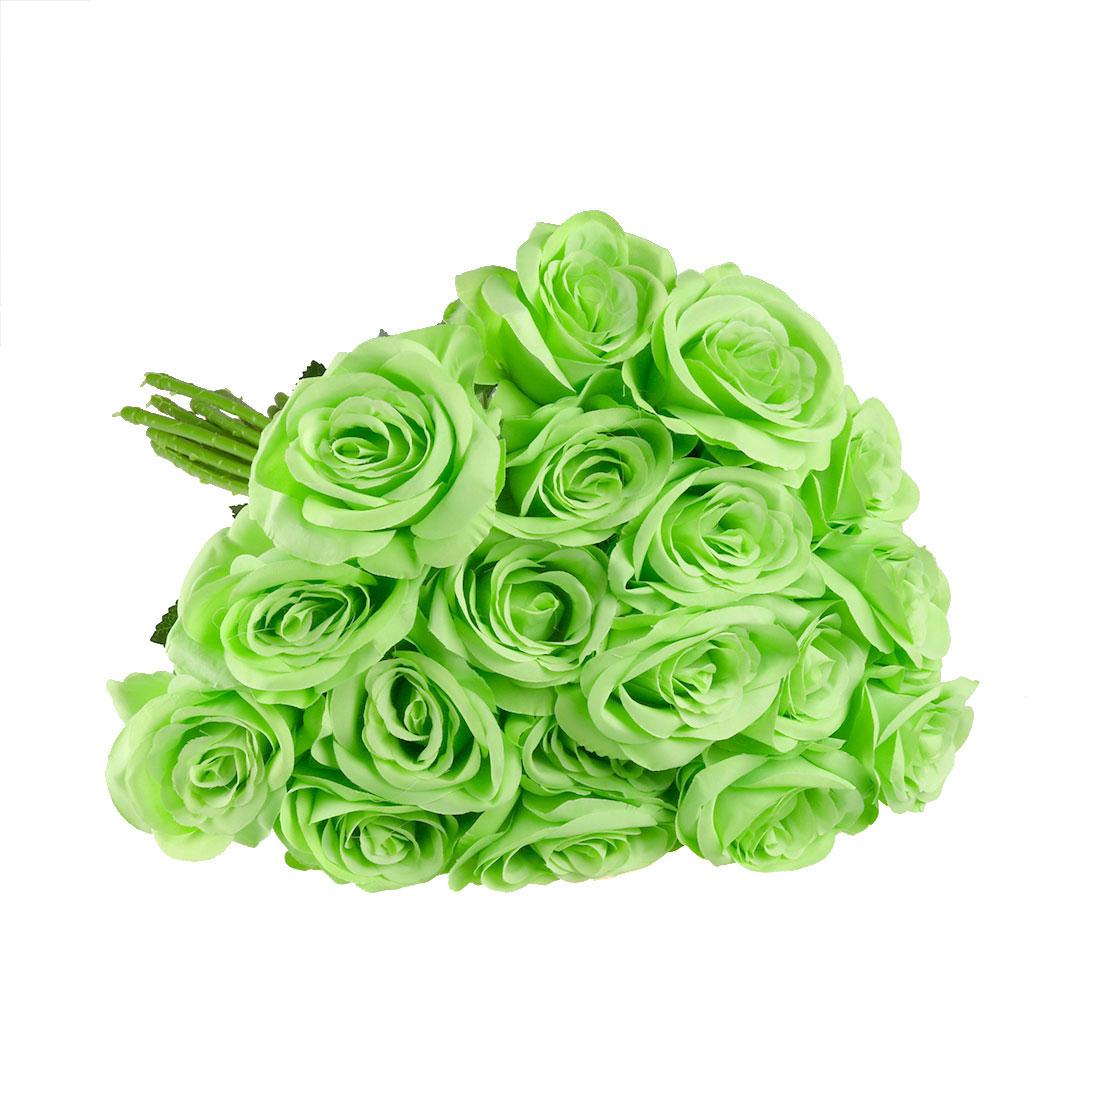 Artificial Silk Vintage Rose Flowers Bouquet Wedding Home Decoration Green 18pcs